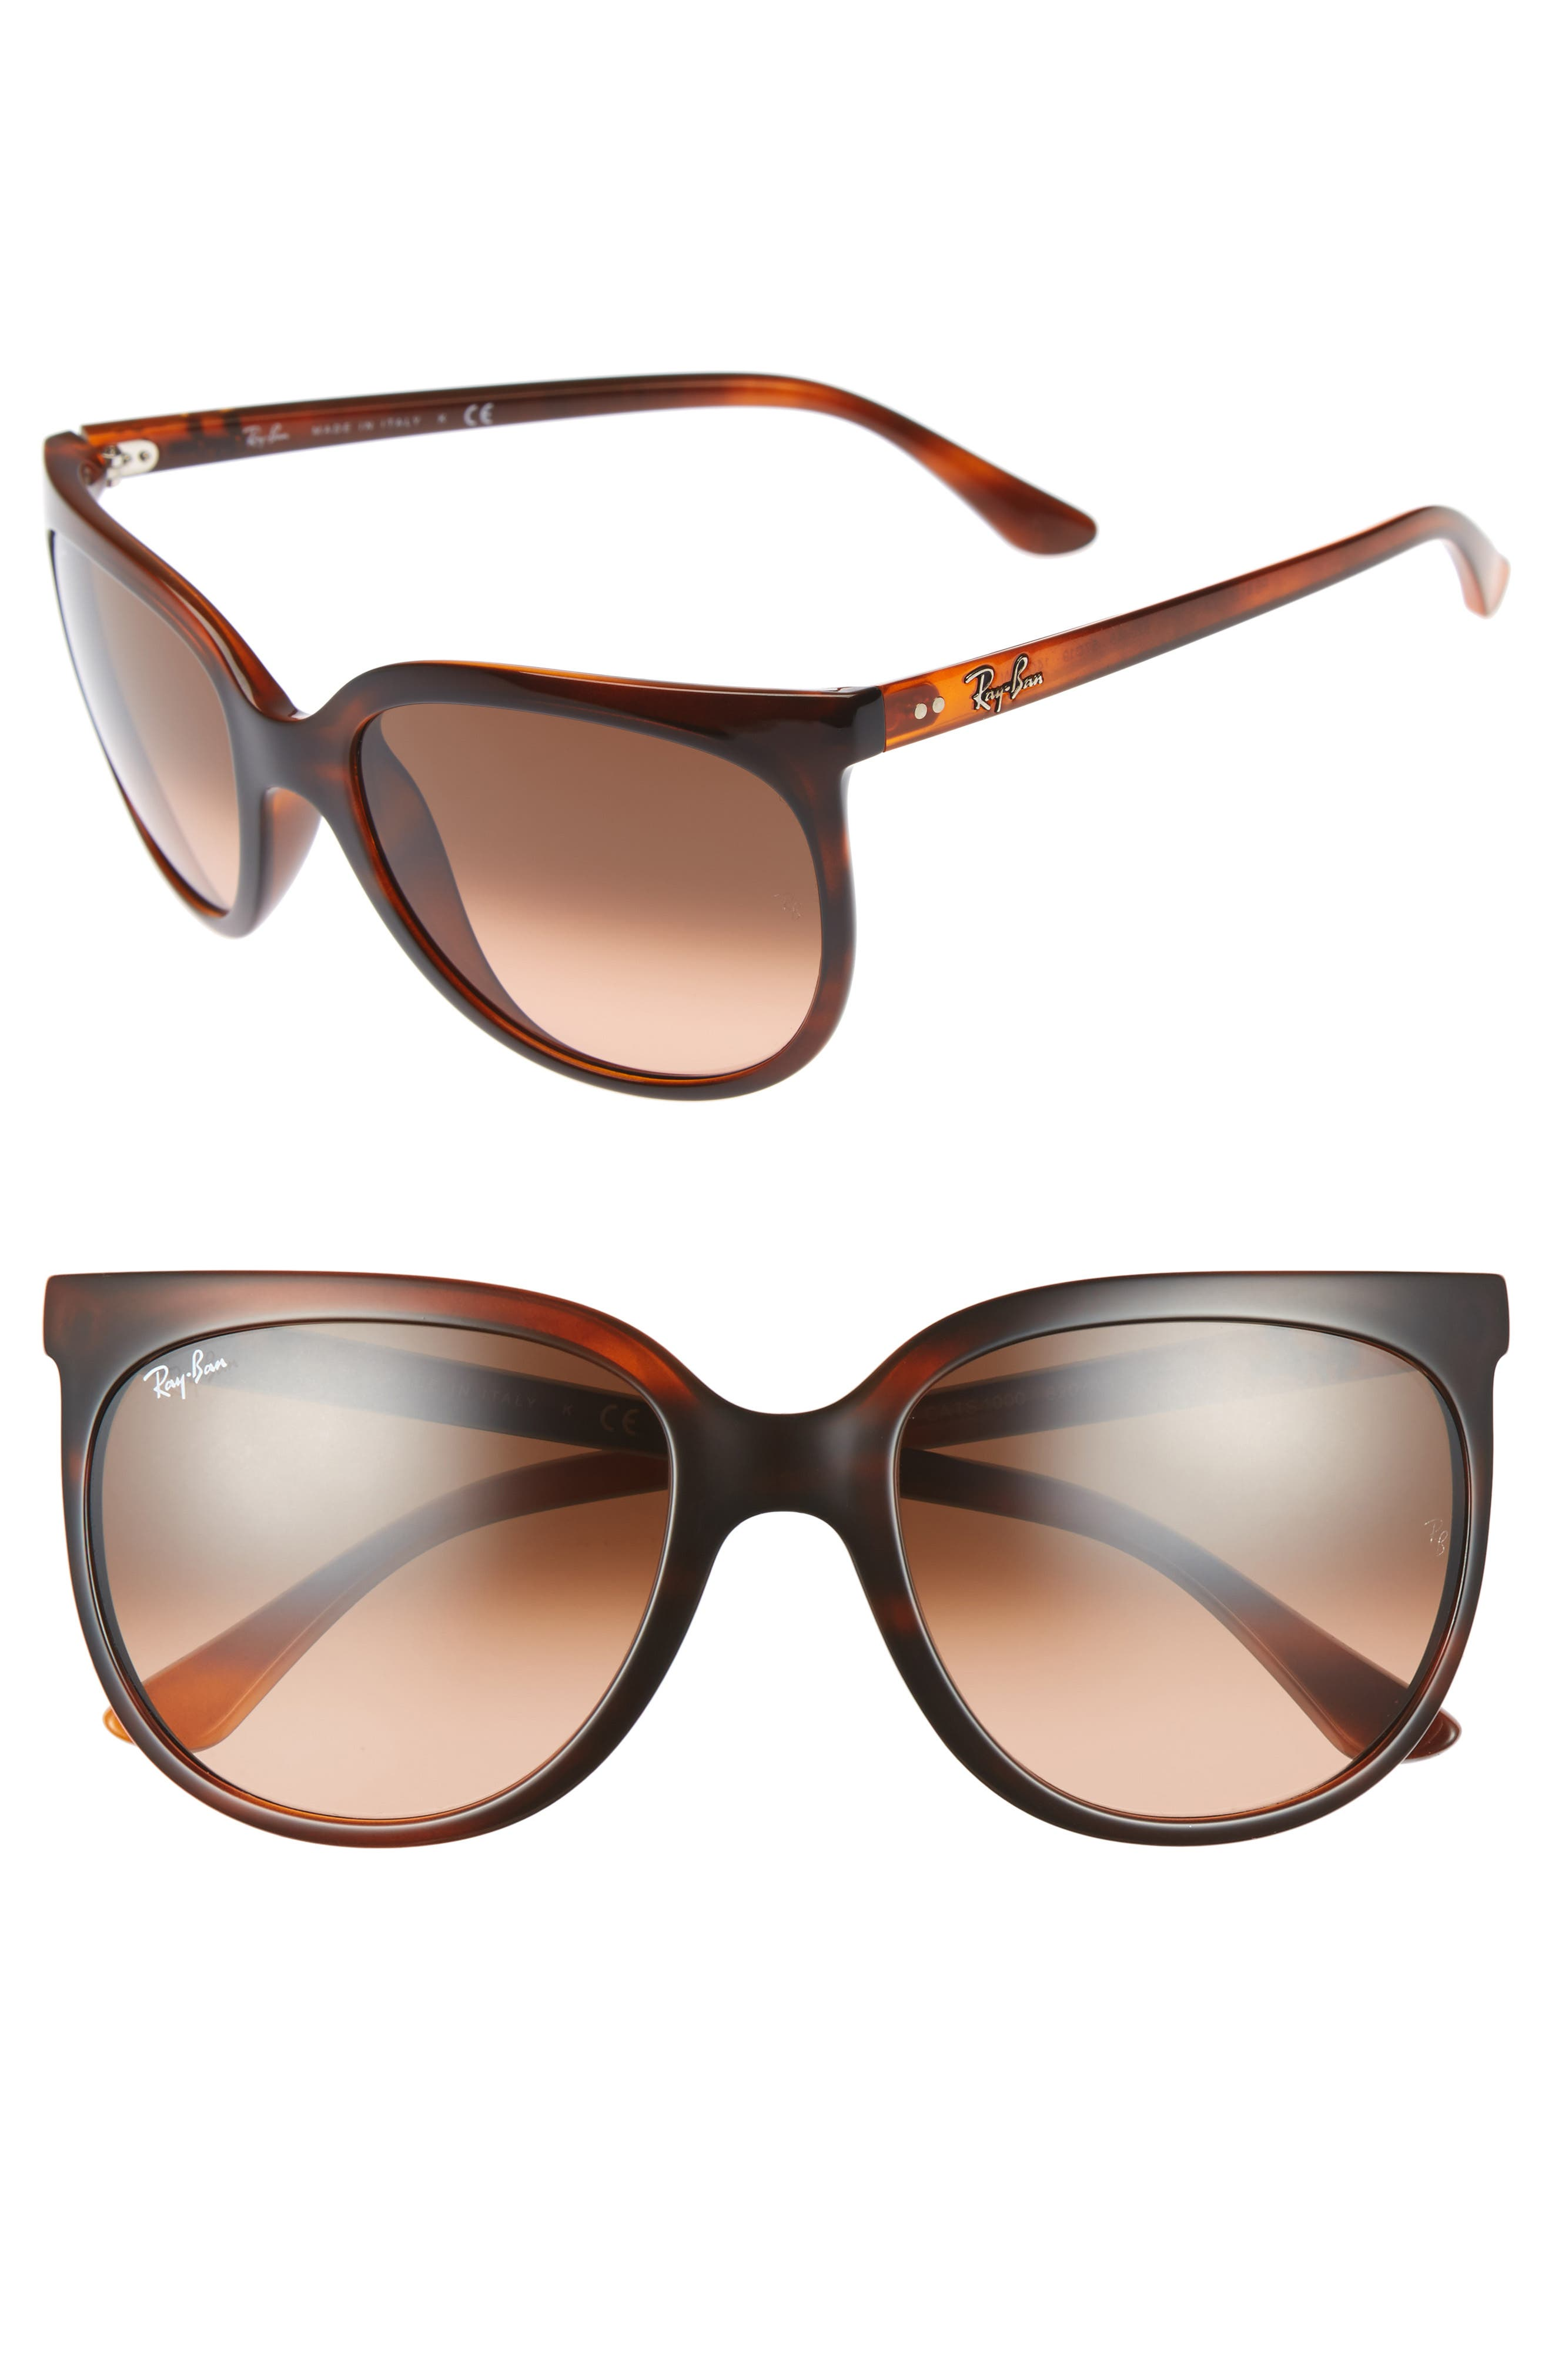 Retro Cat Eye Sunglasses,                             Main thumbnail 5, color,